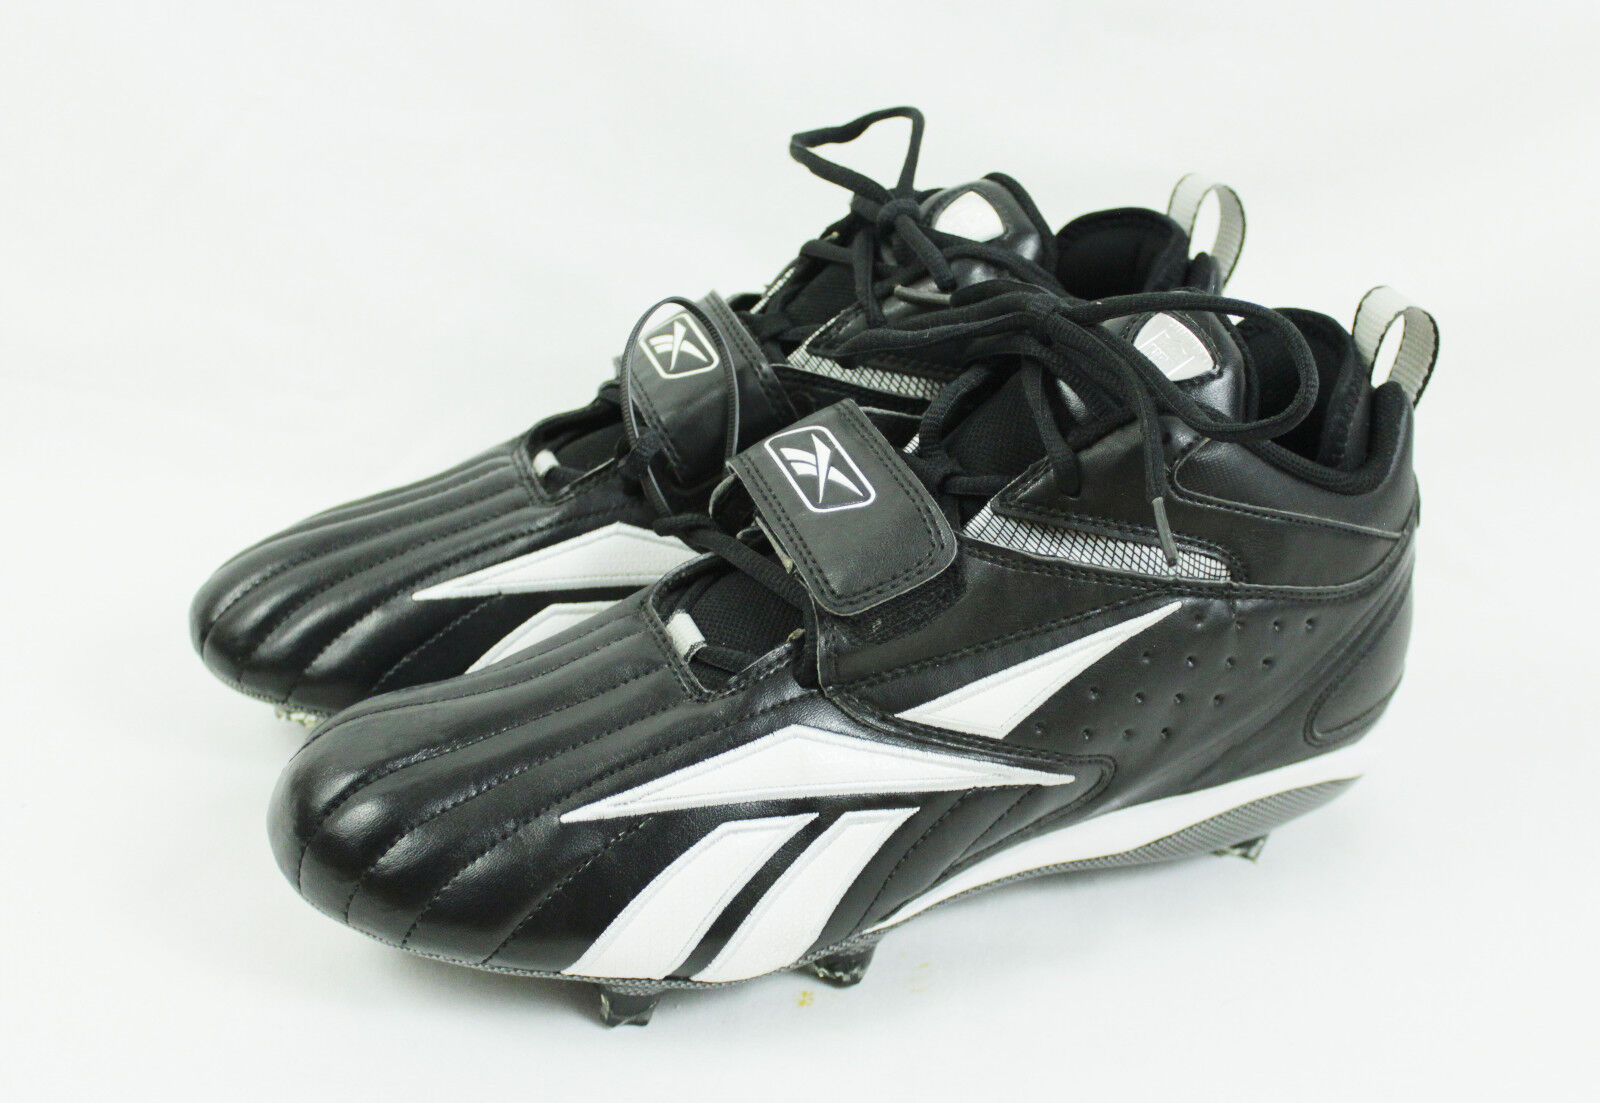 b07452439147 Mens Black White Reebok NFL Equipment Play Dry Football Cleats Size ...